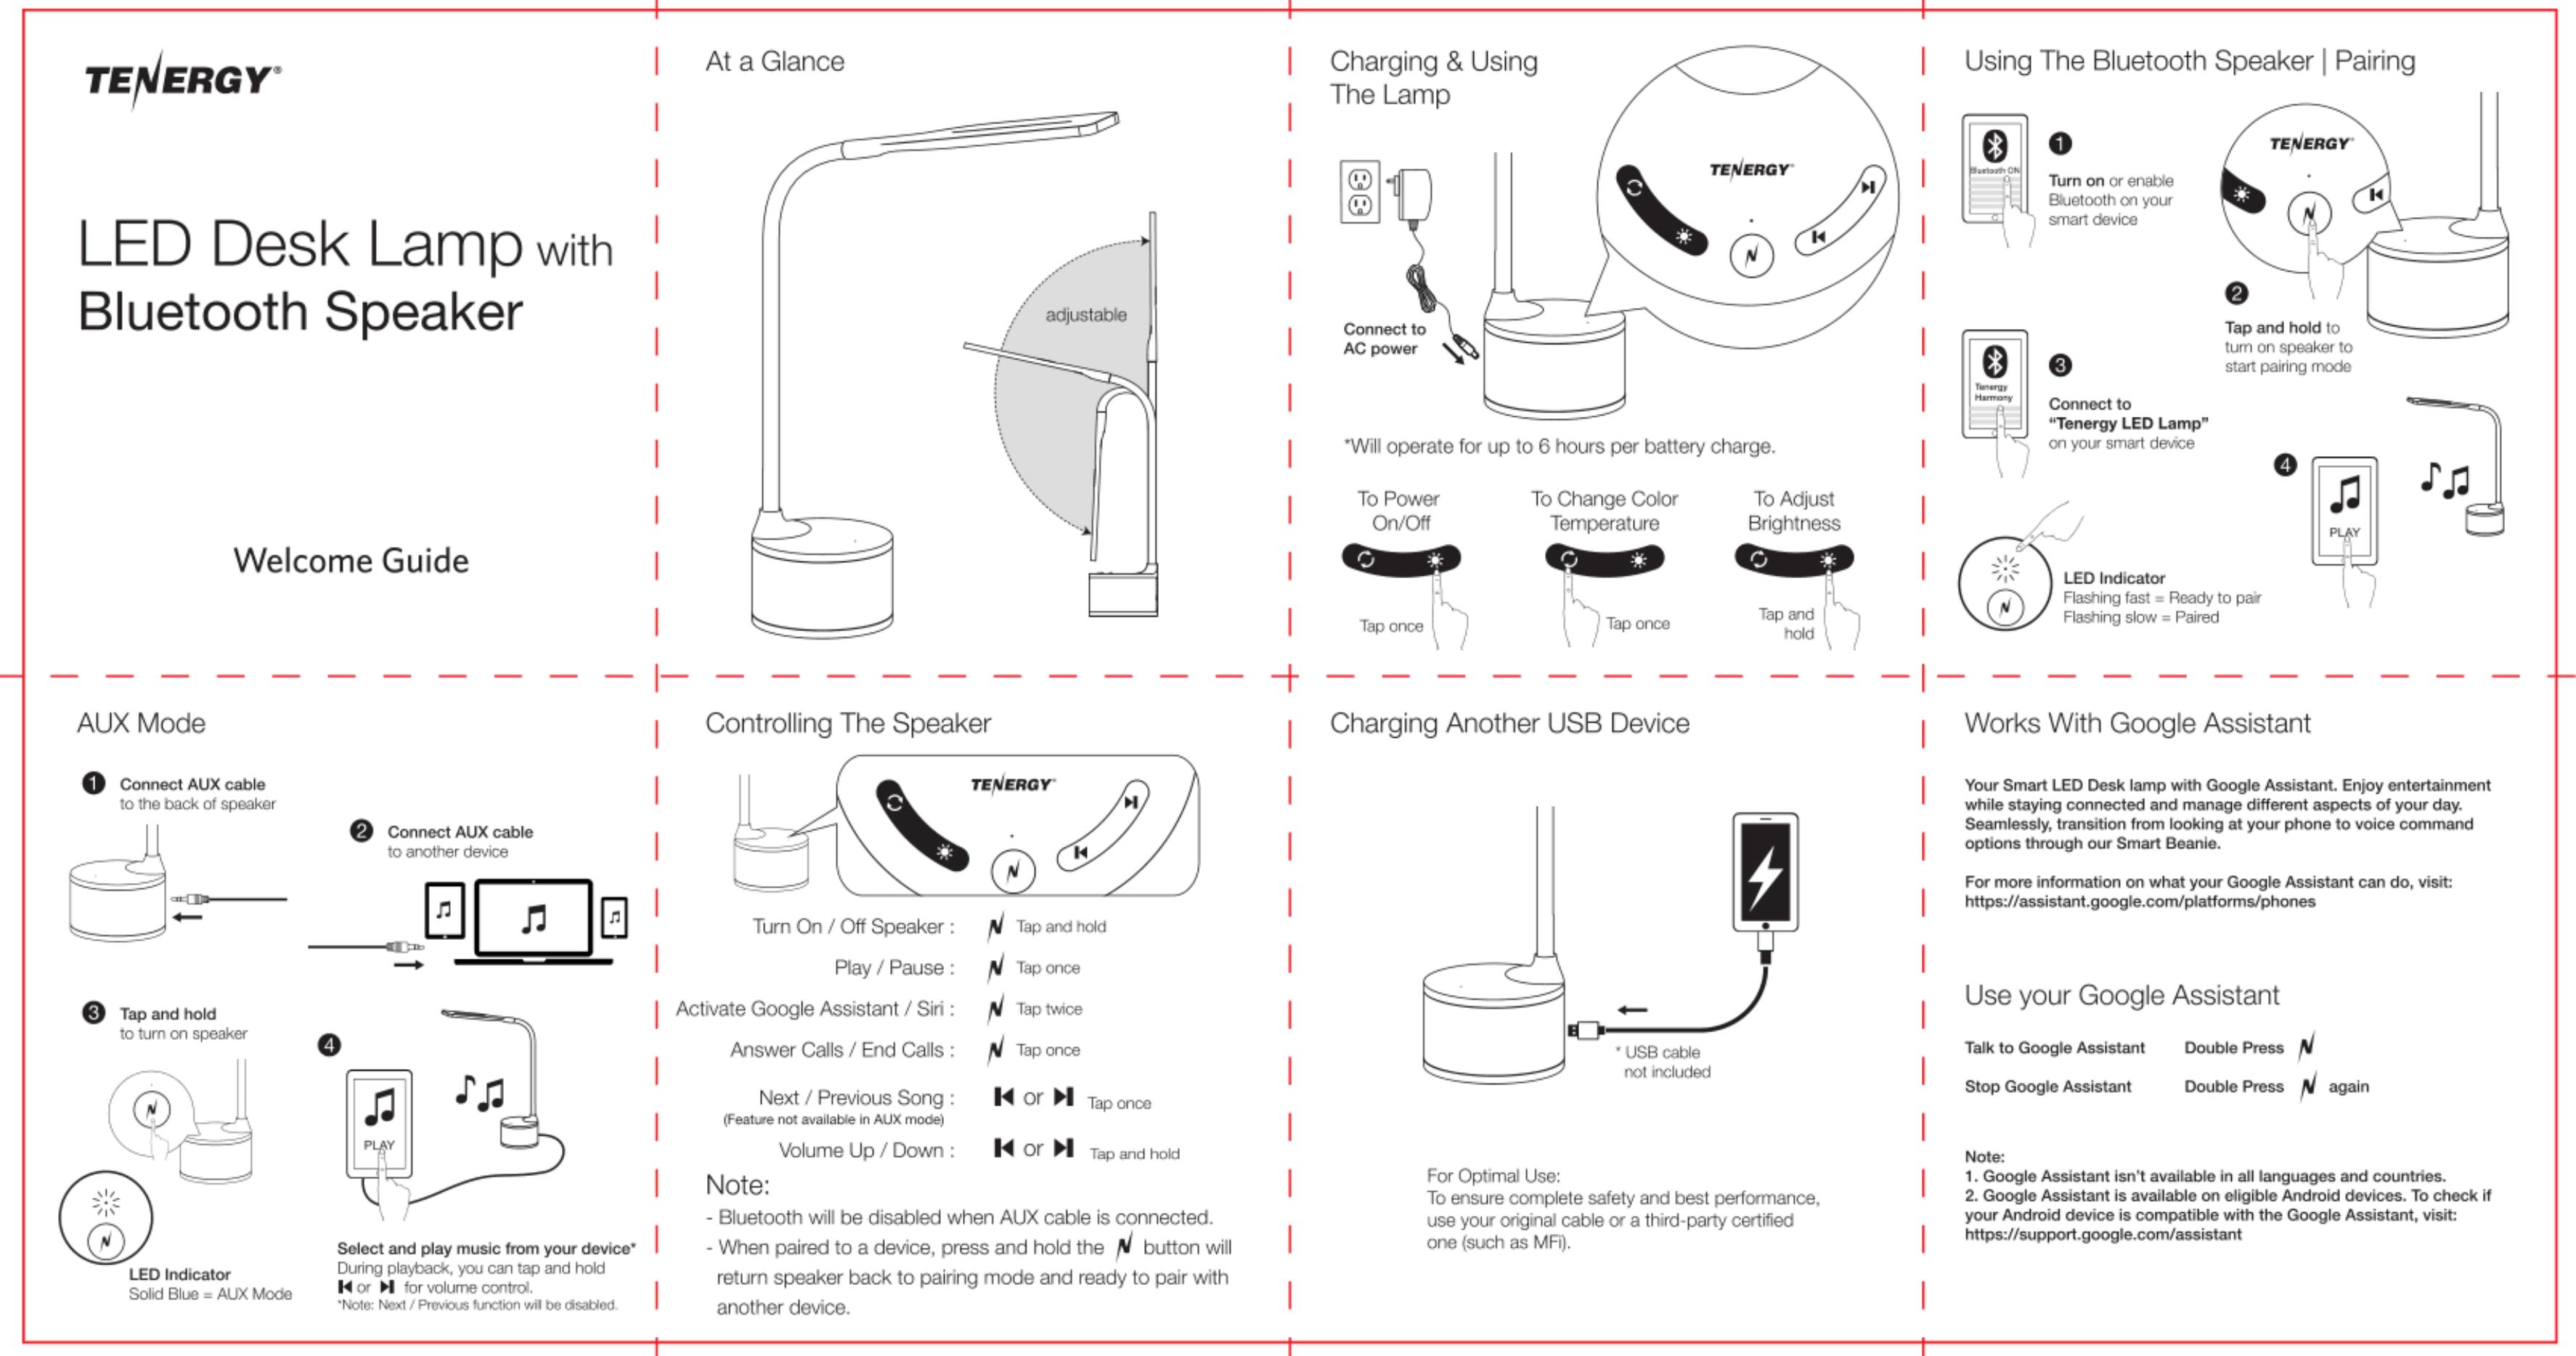 Tenergy 59122 Led Desk Lamp With Bluetooth Speaker User